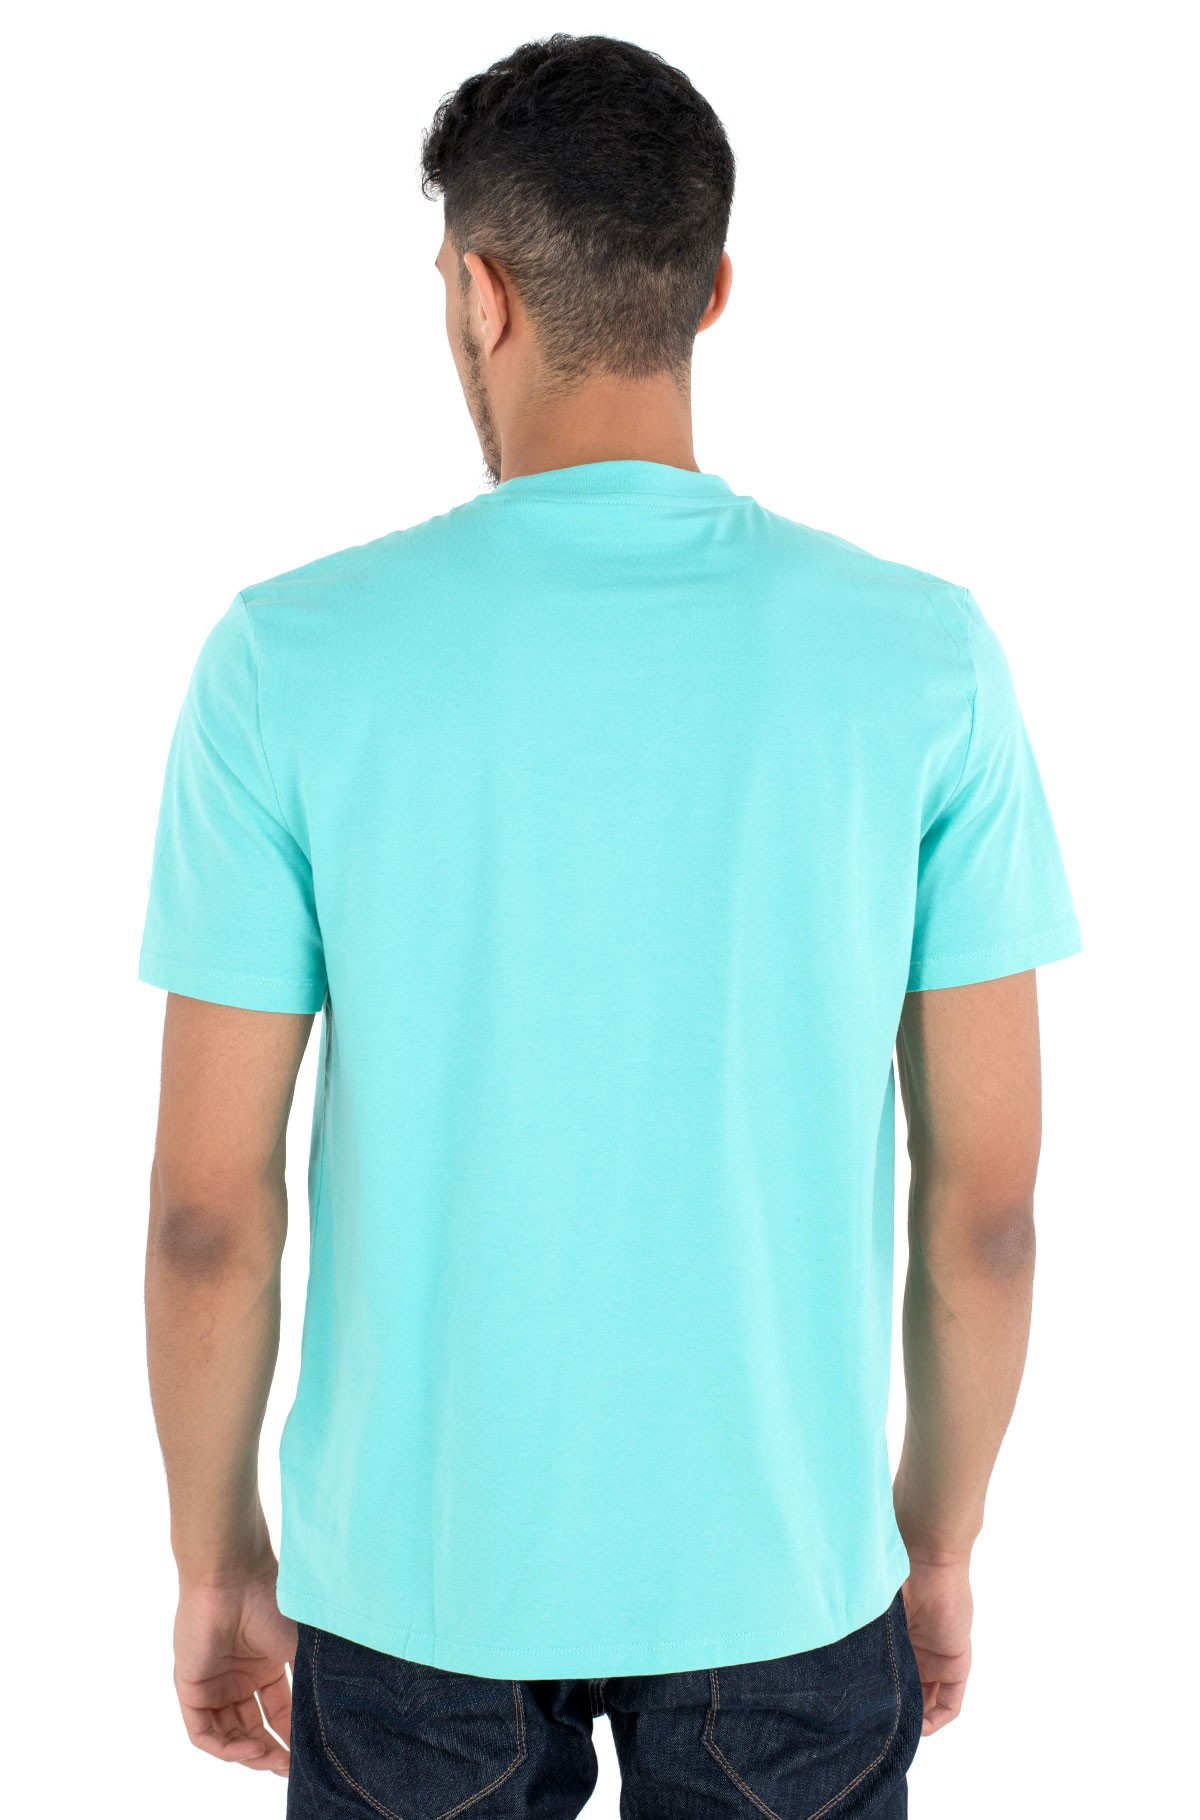 T-shirt U1GA06 J1311-full-2